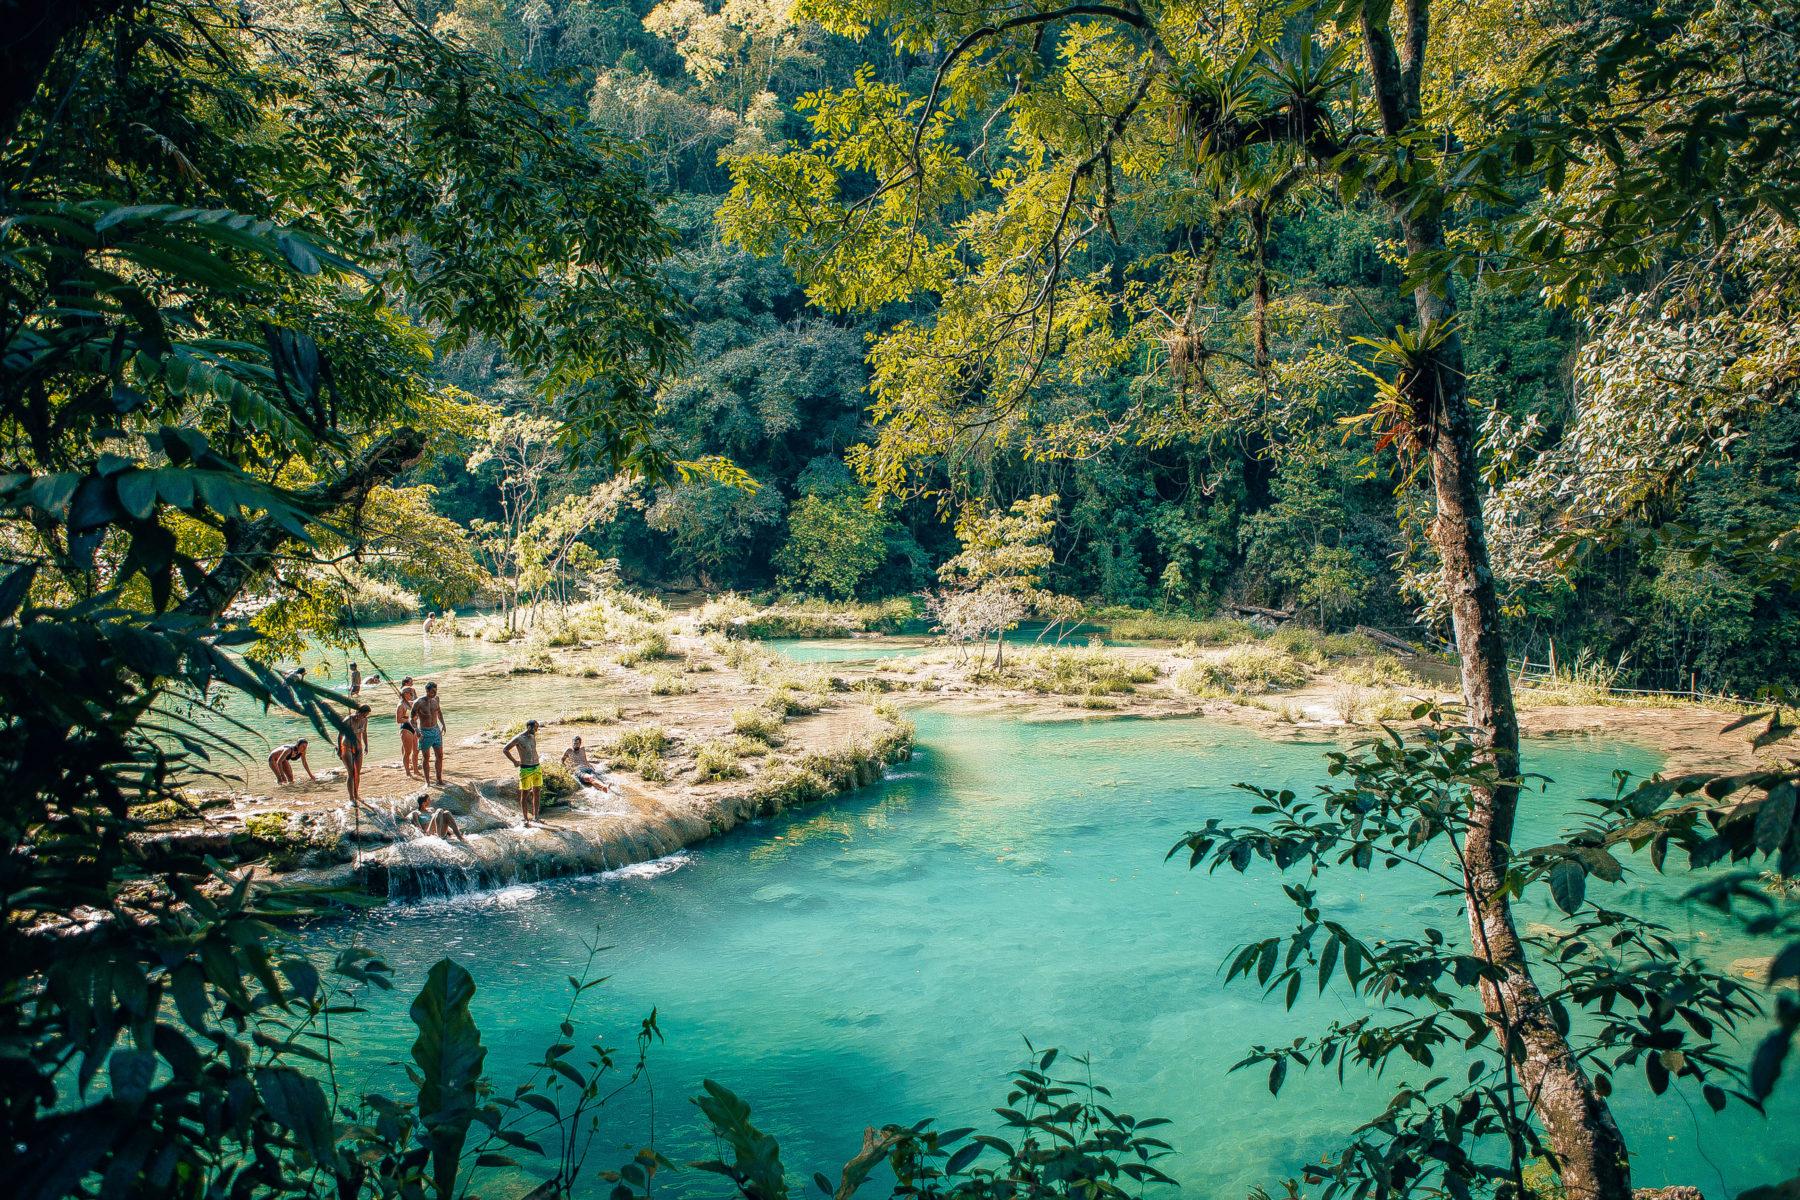 guatemala semuc champey turquoise pools jungle green humid swim adventure far away hidden paradise el retiro lodge in the jungle cacao pure natural pools